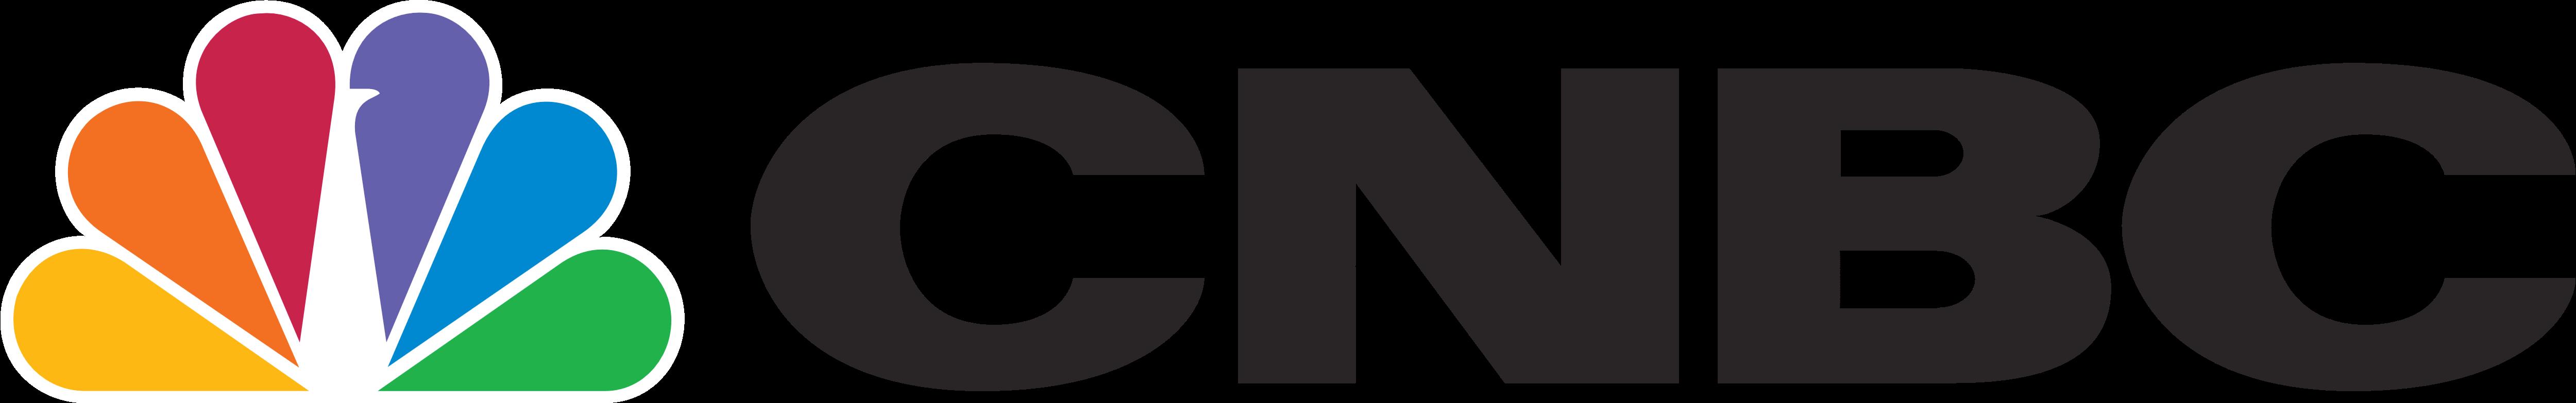 CNBC_logo_horizontal